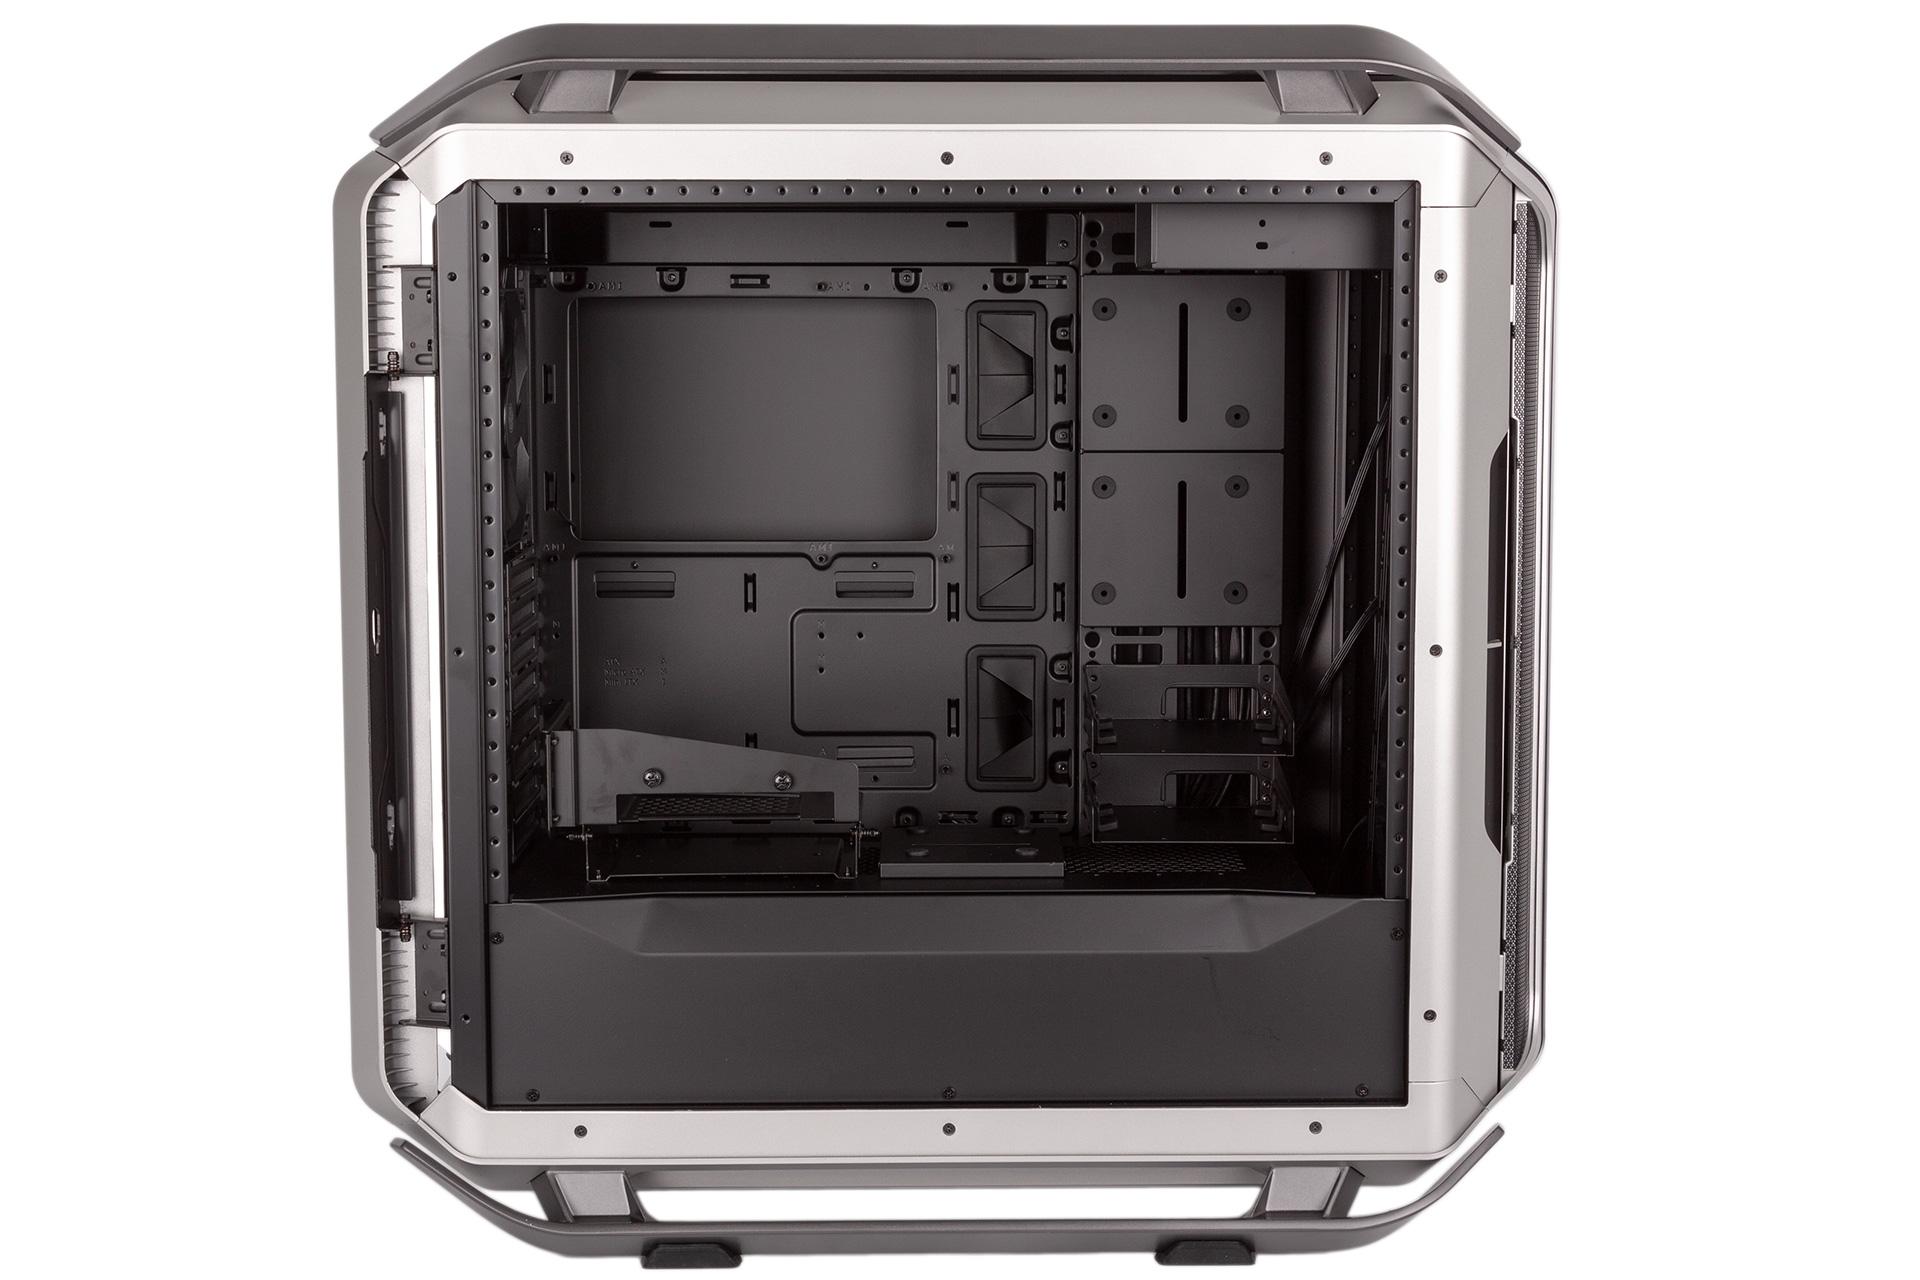 Cooler Master Cosmos C700M Review | bit-tech net